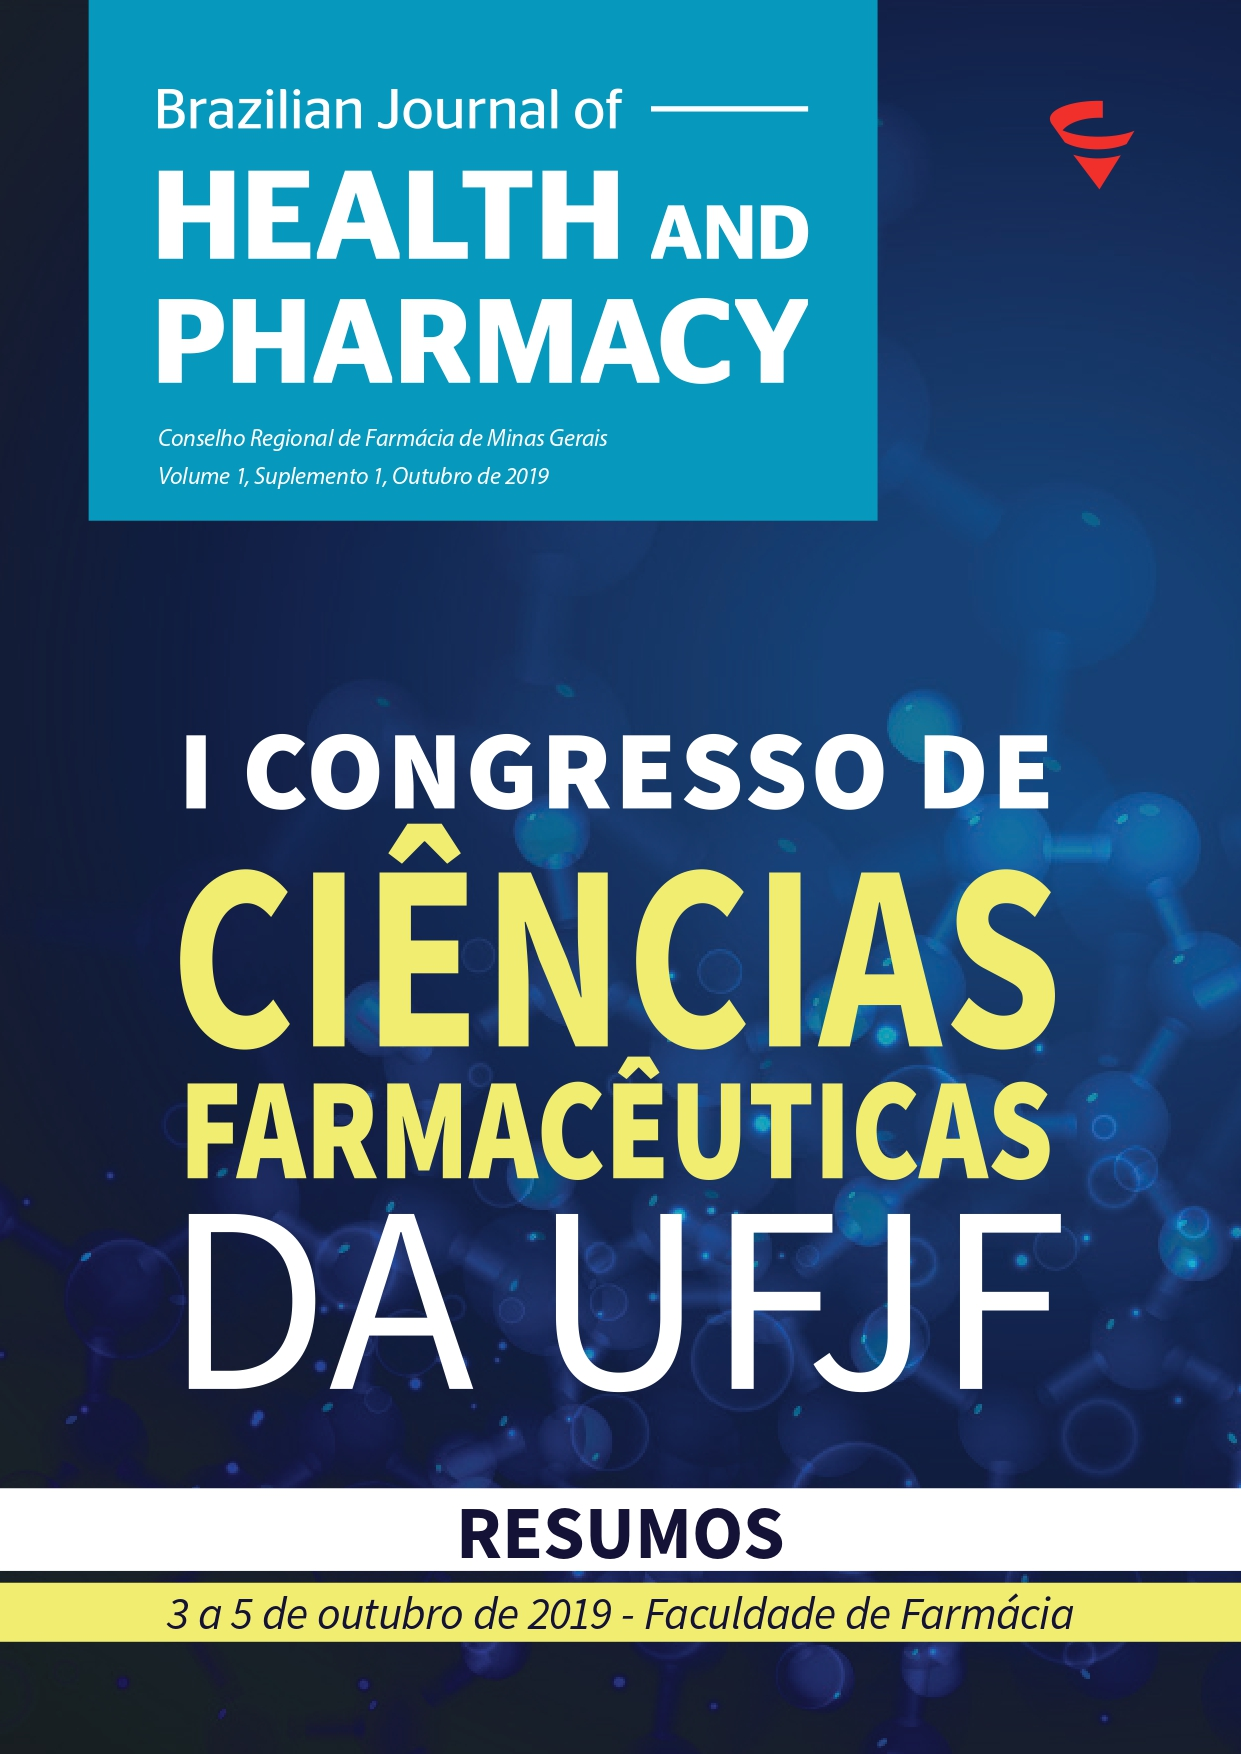 Capa Revista Cientifica BJHP V1 S1